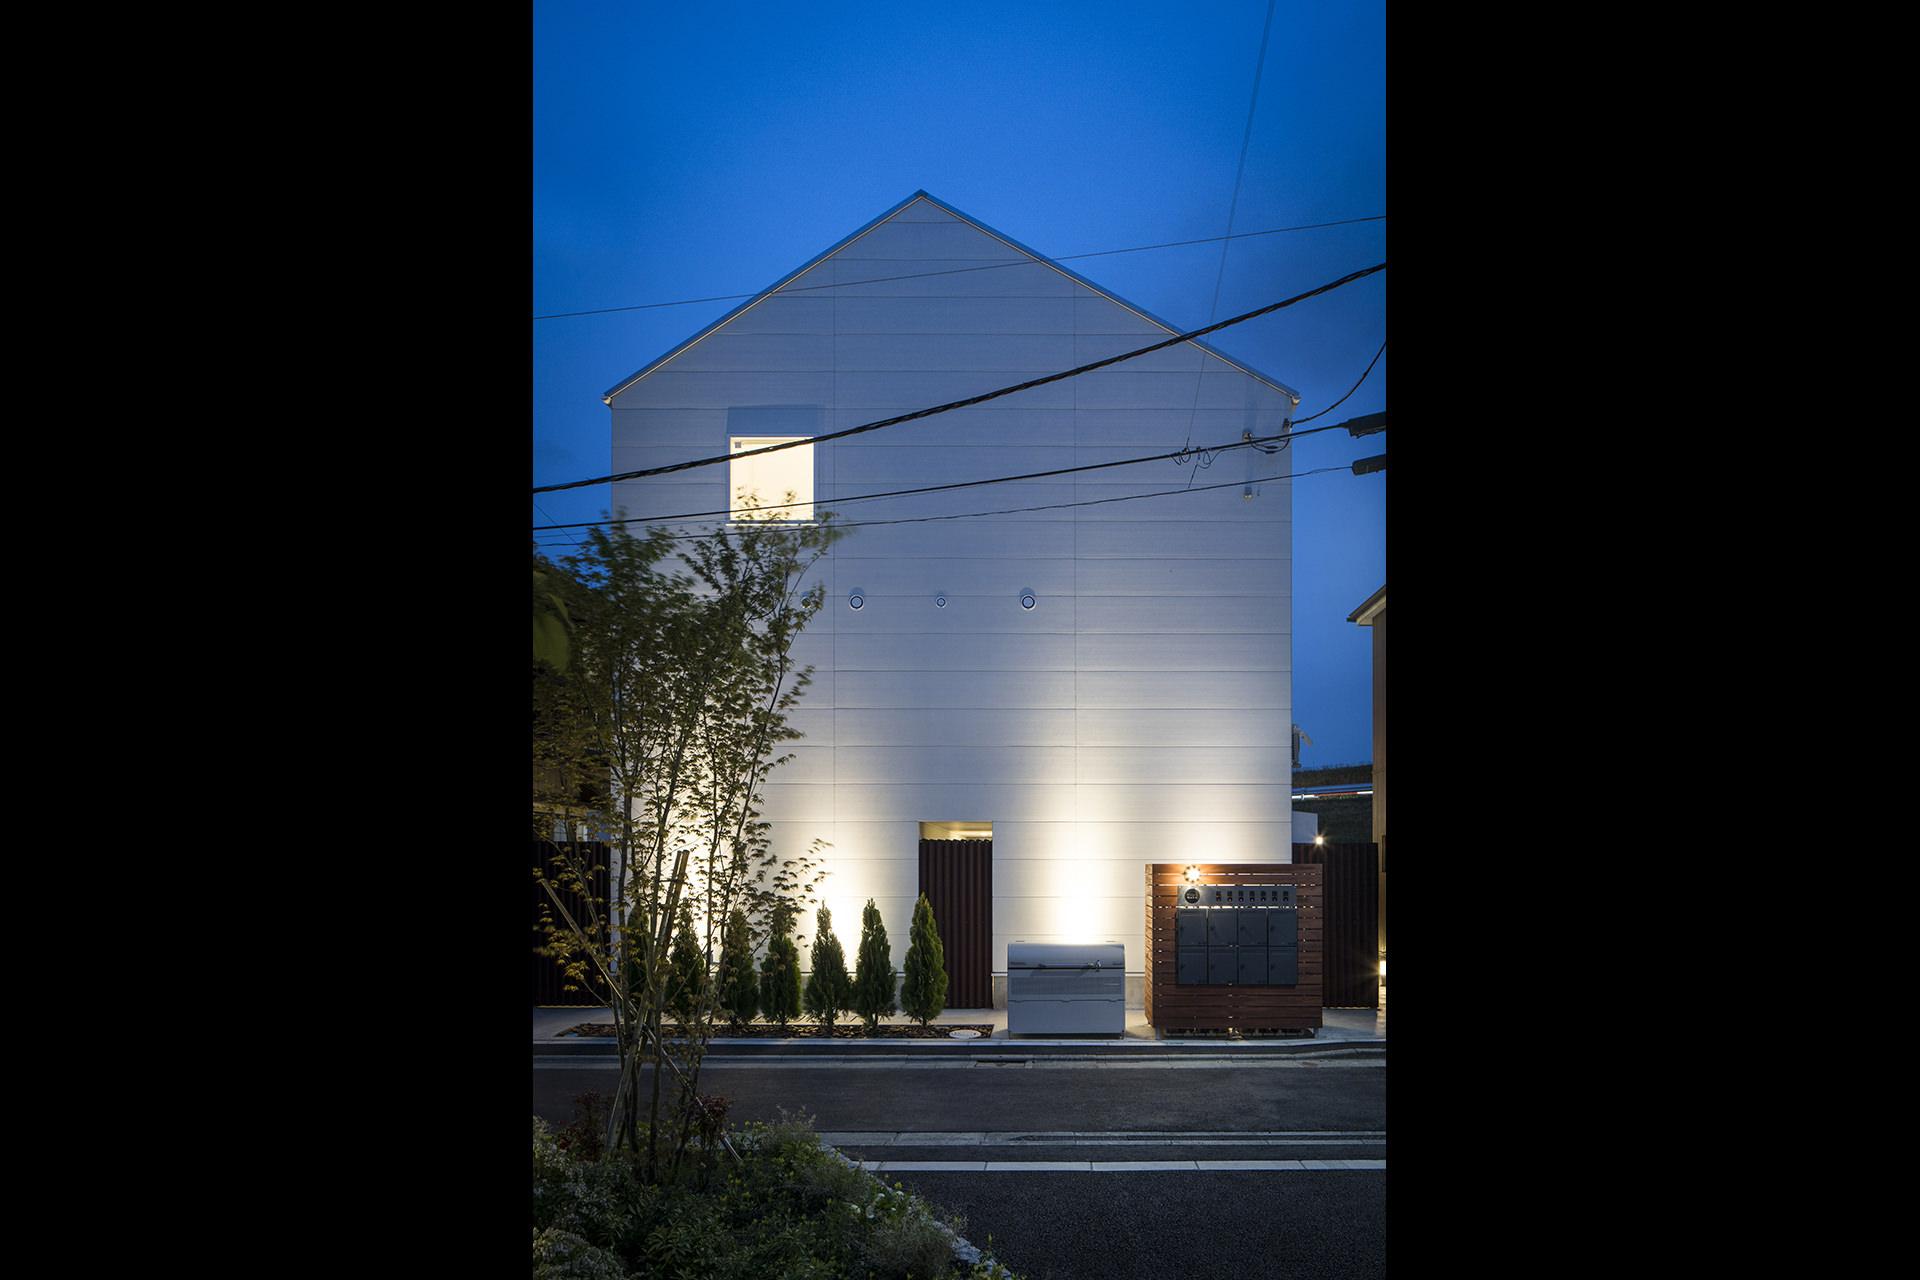 Maison Neko 撮影イメージ18 撮影:東涌写真事務所・東涌宏和